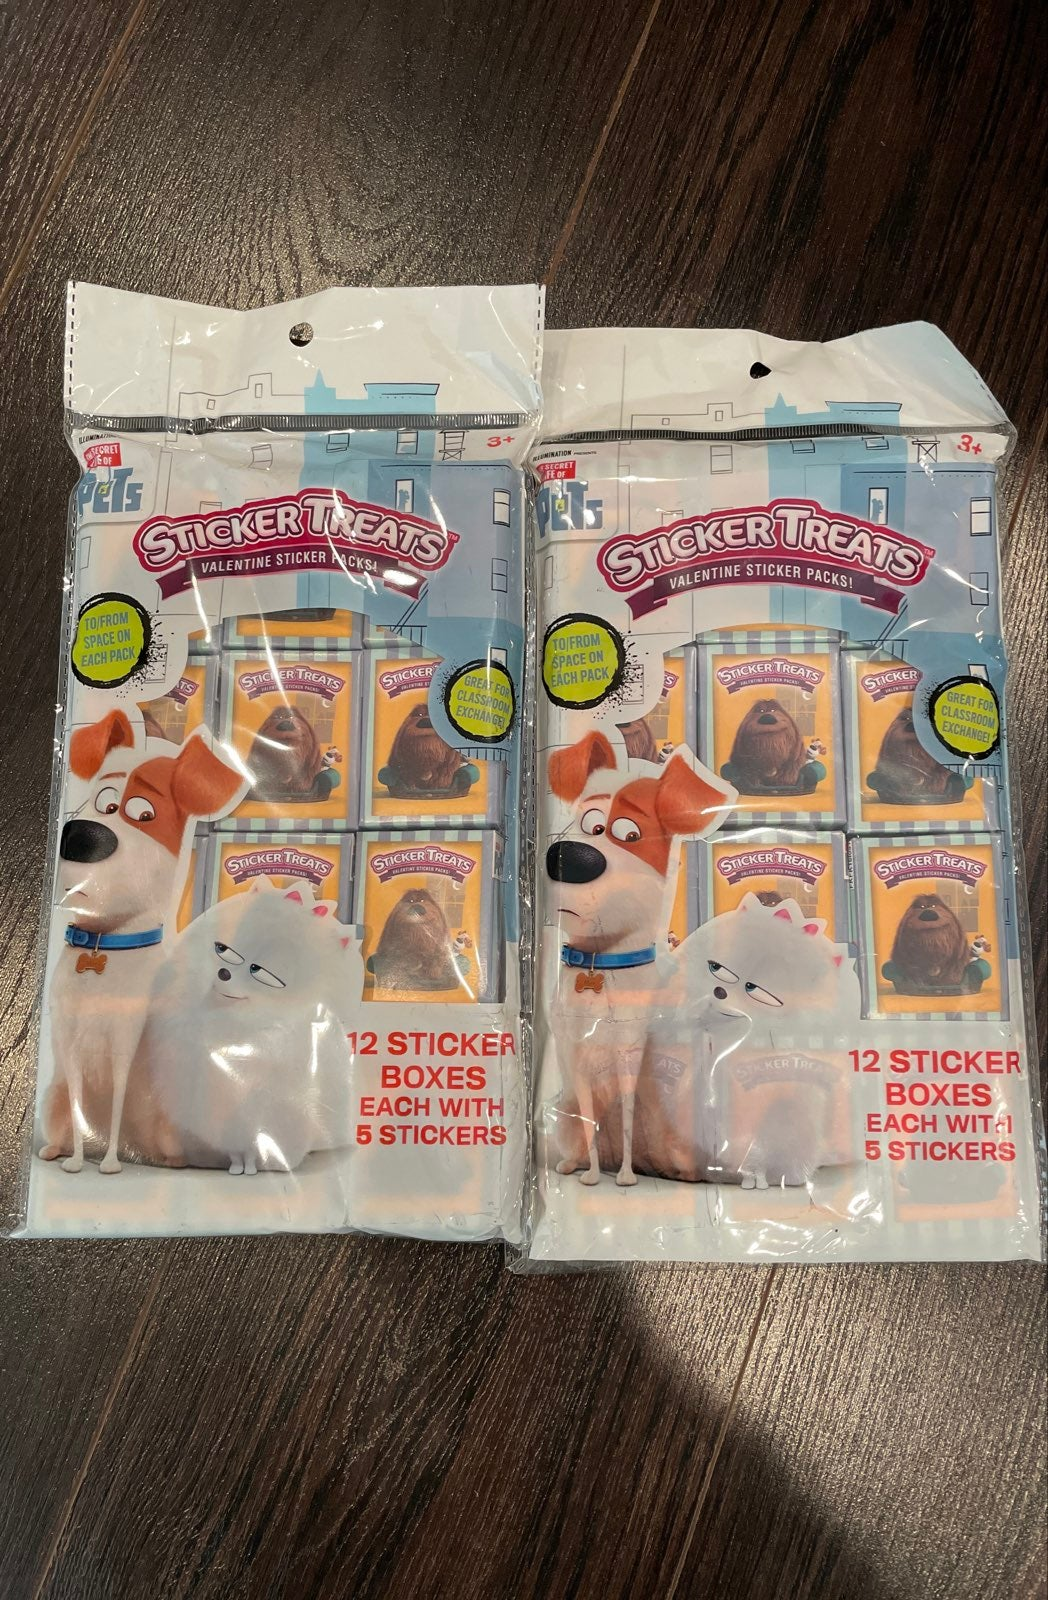 NEW TWO PACKS OF SECRET LIFE OF PETS STI